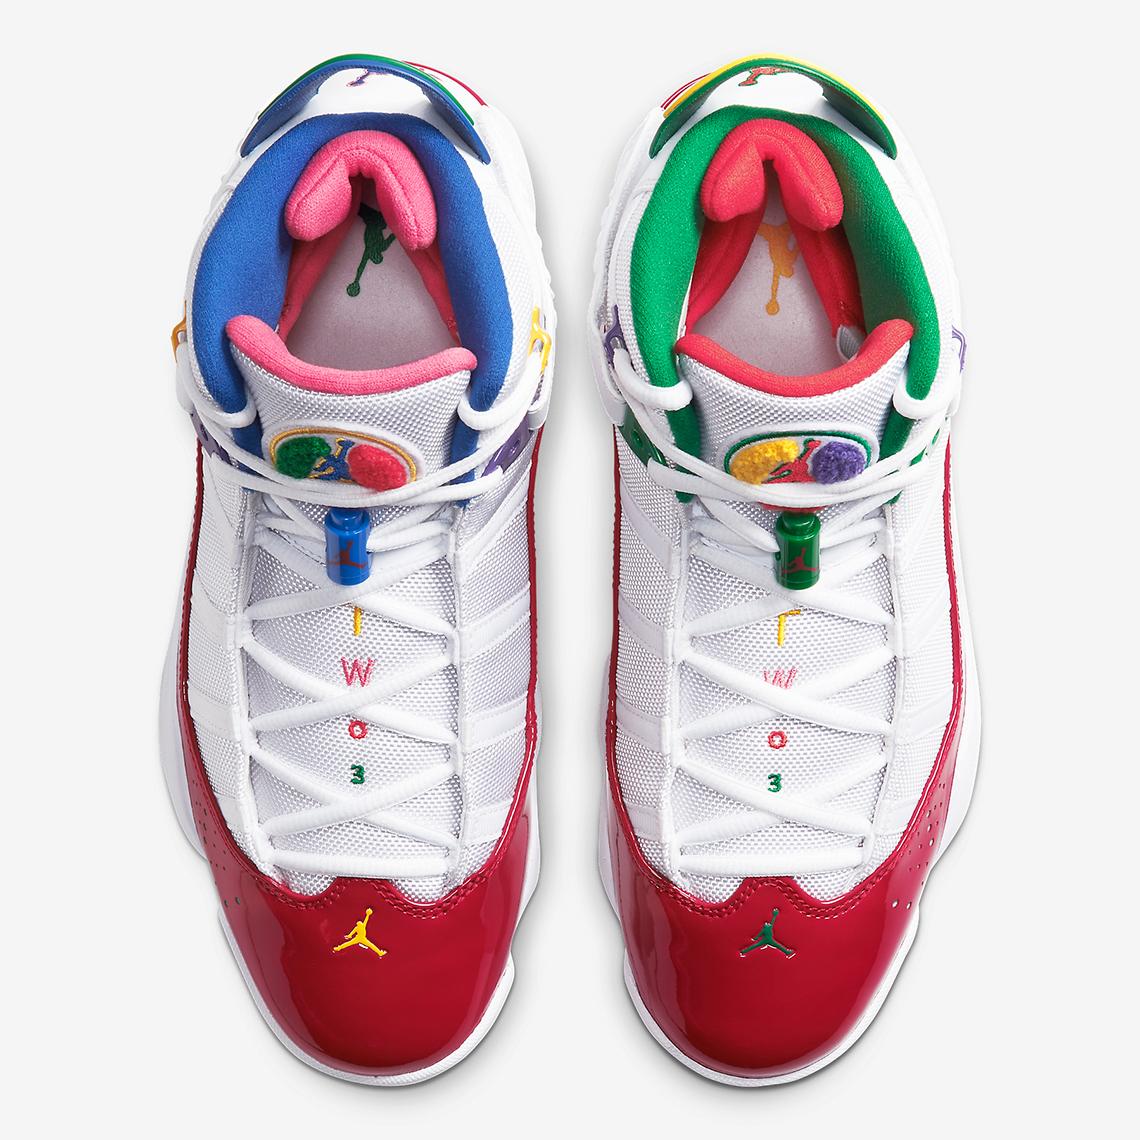 Jordan 6 Rings CW7003-100 Release Info